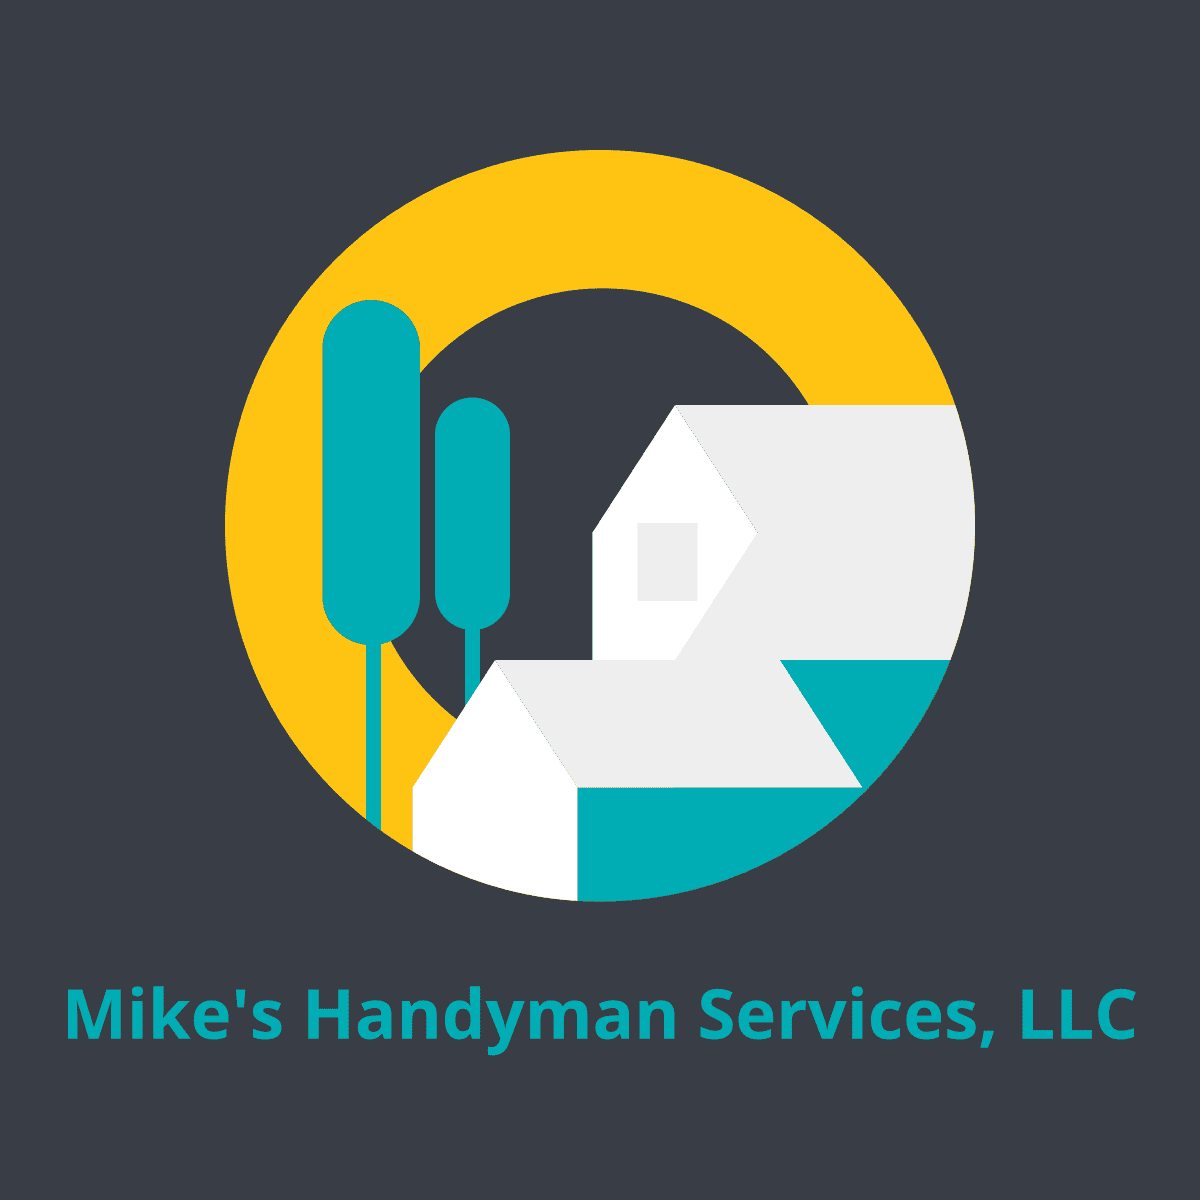 Mike's Handyman Services, LLC - Redmond Washington home